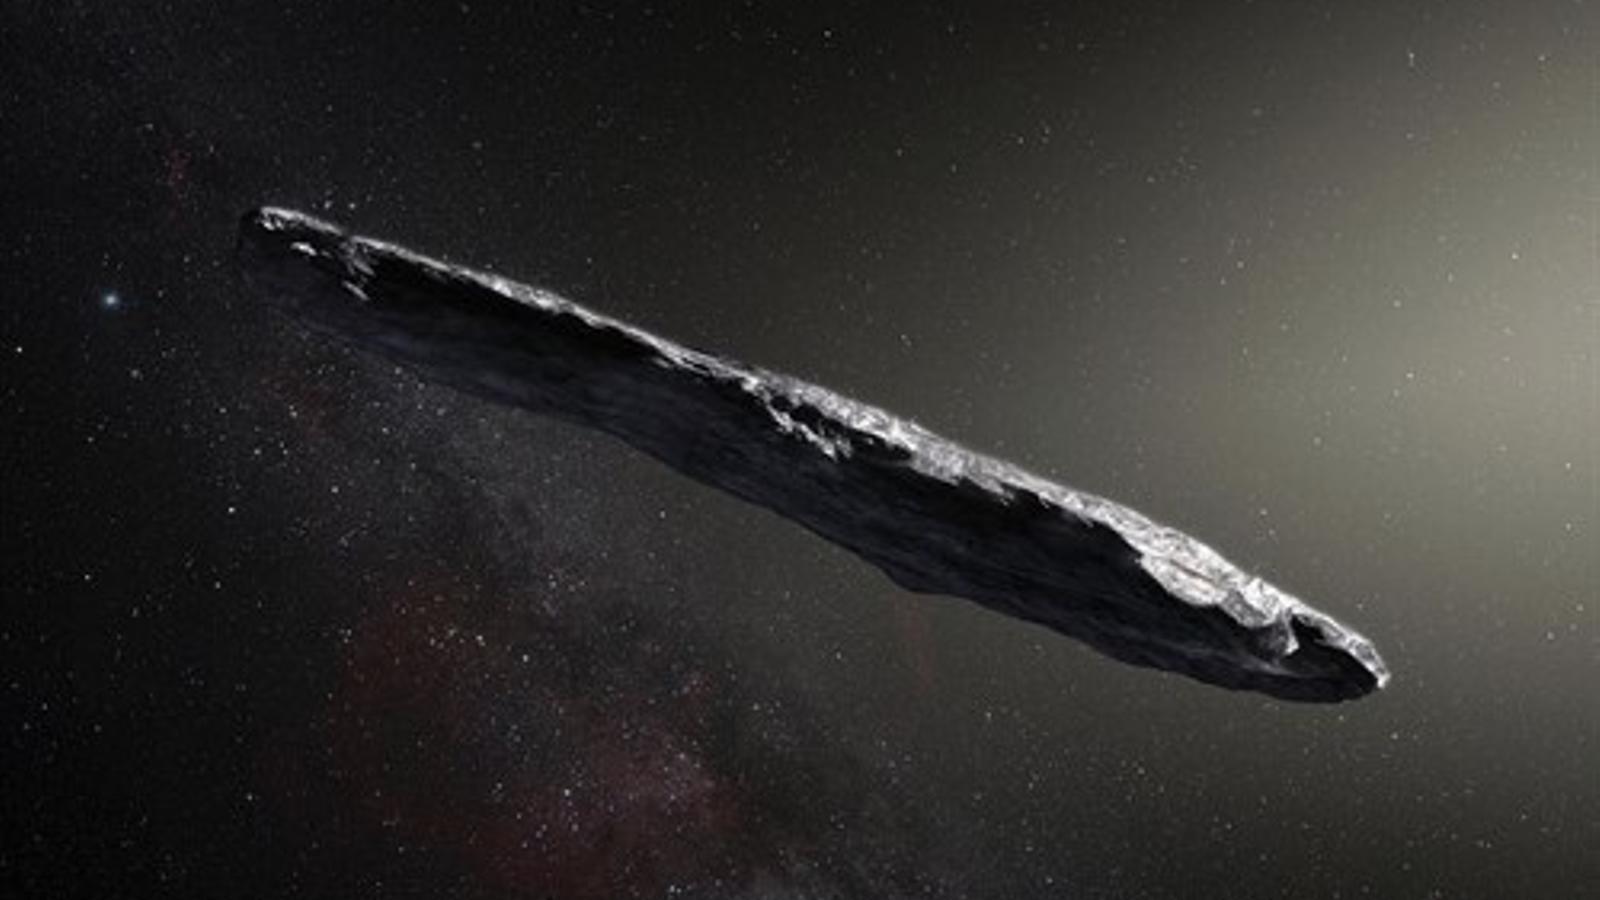 Representació gràfica de l'asteroide interestel·lar Oumuamua